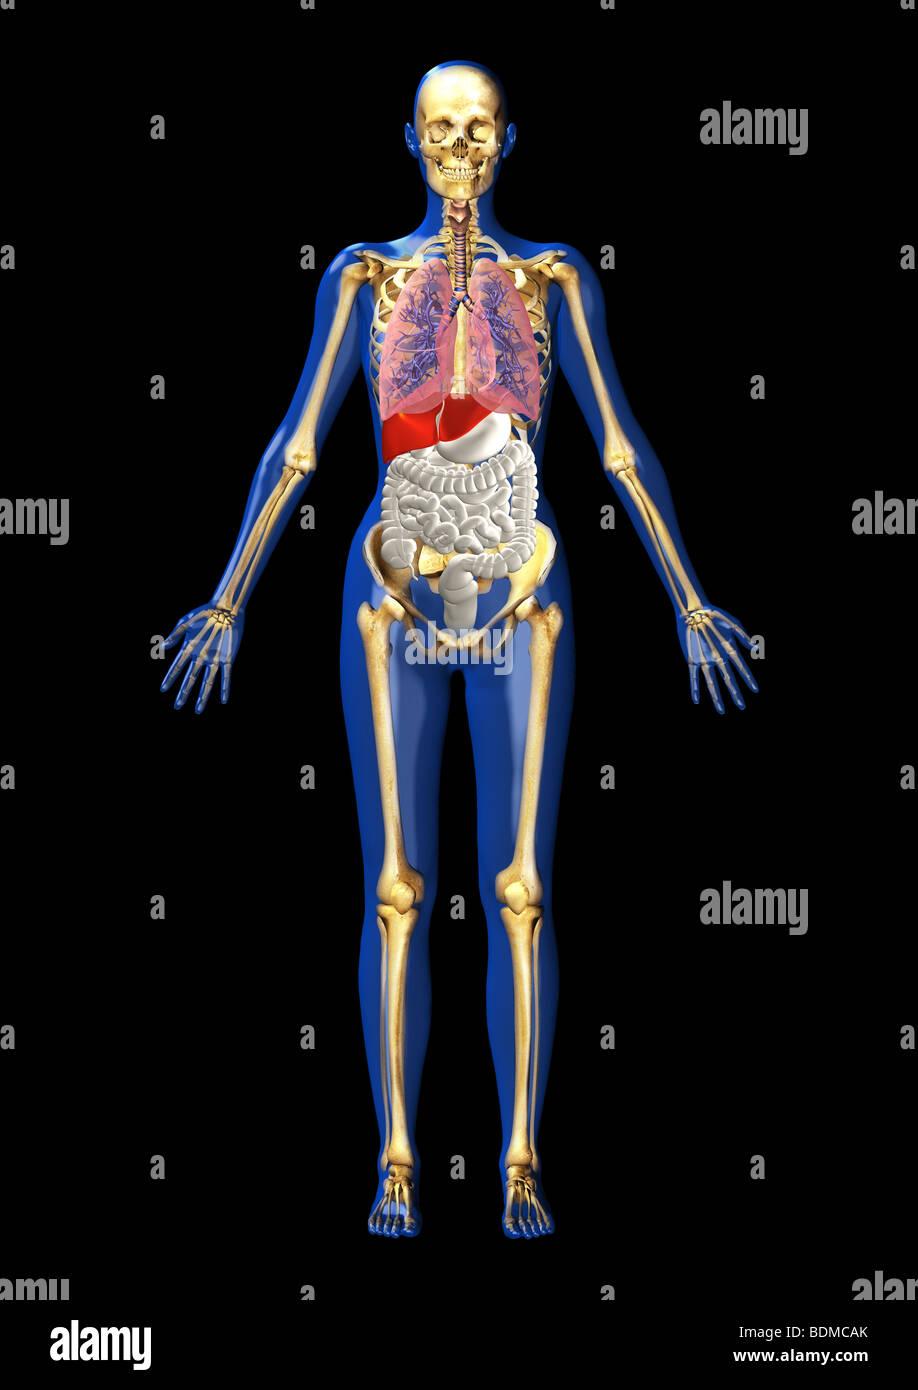 human anatomy illustration showing - Stock Image